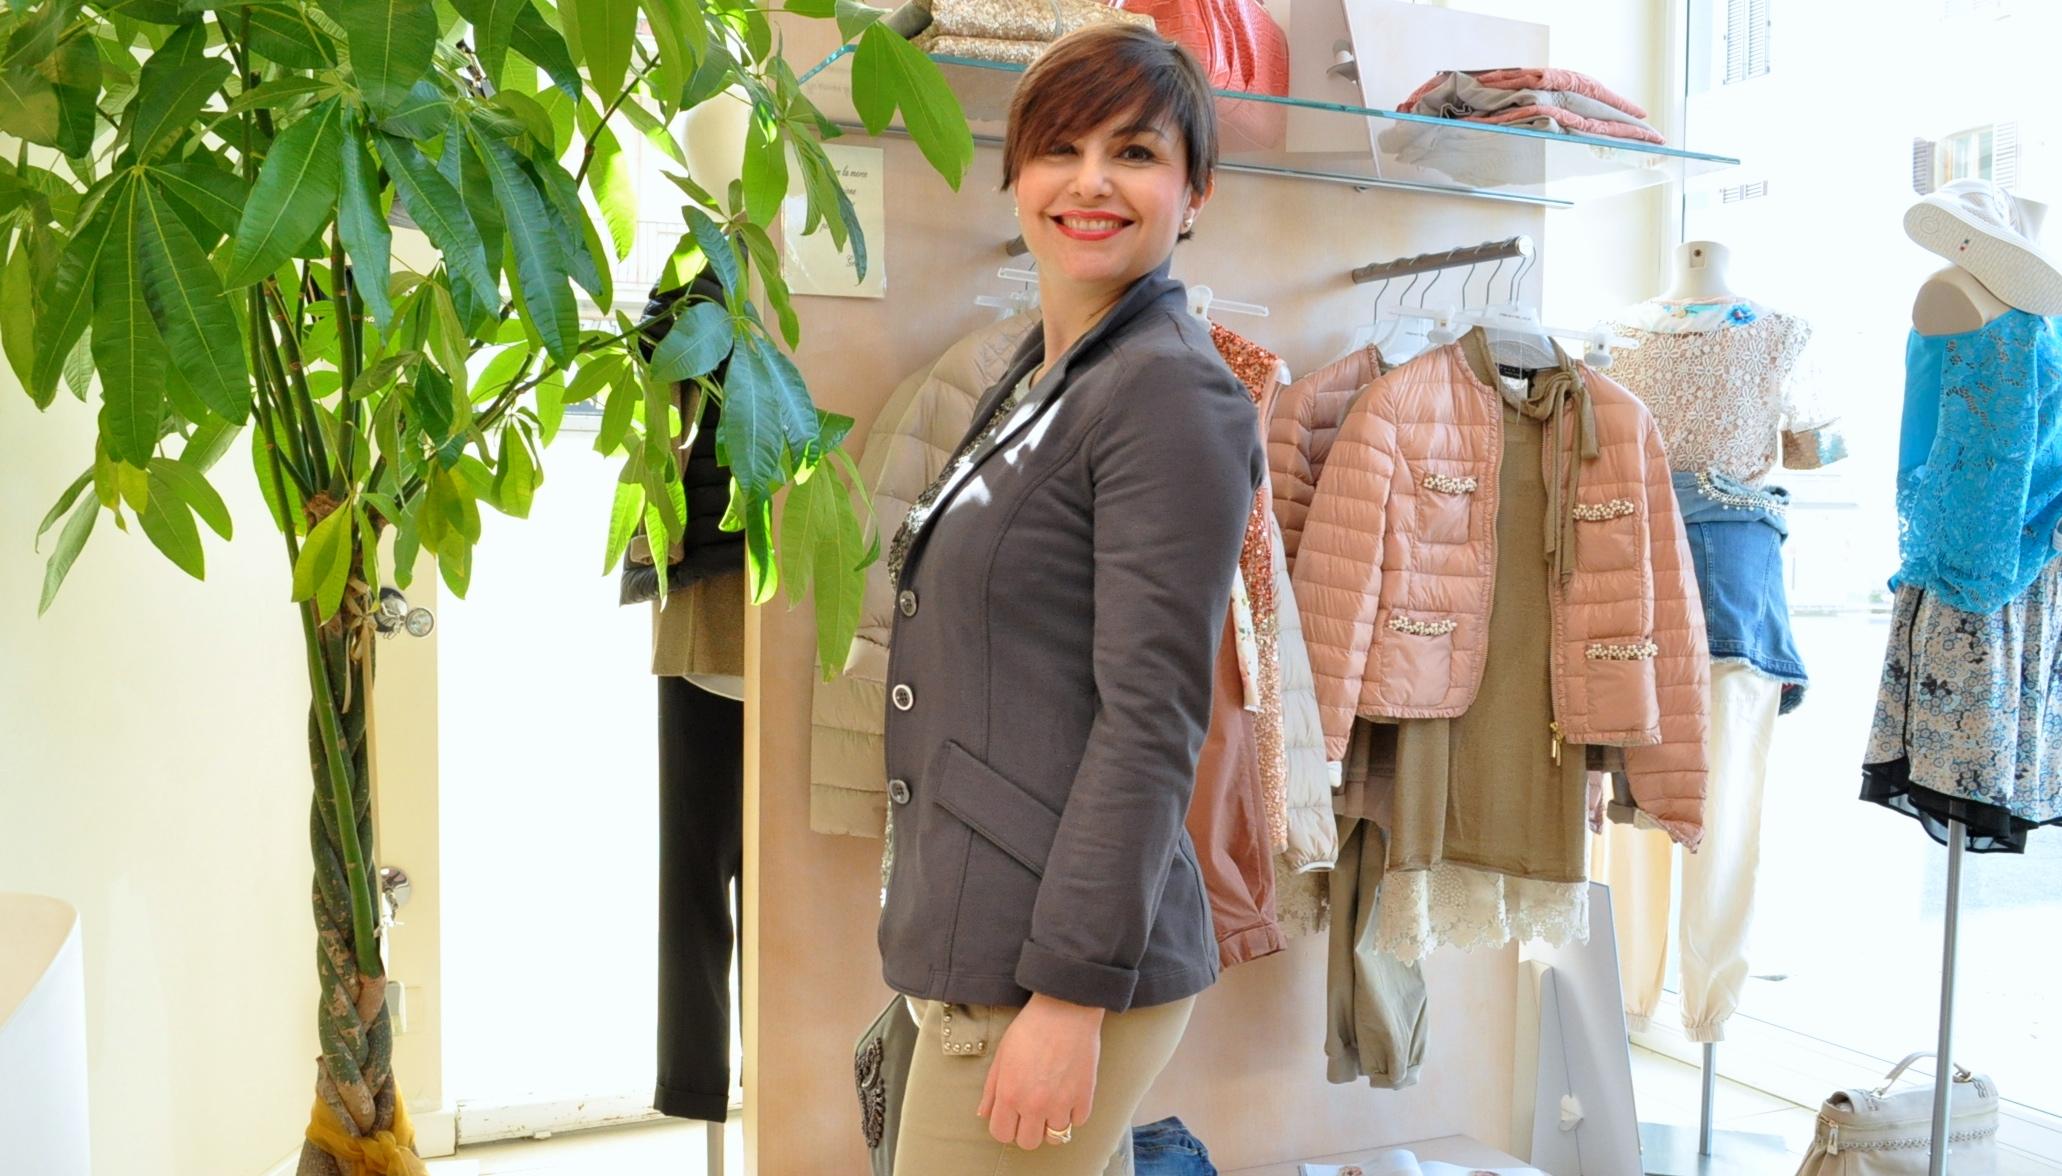 low priced 1fdee 98def Giacca donna Firenze Empoli Abbigliamento donna - Boutique ...